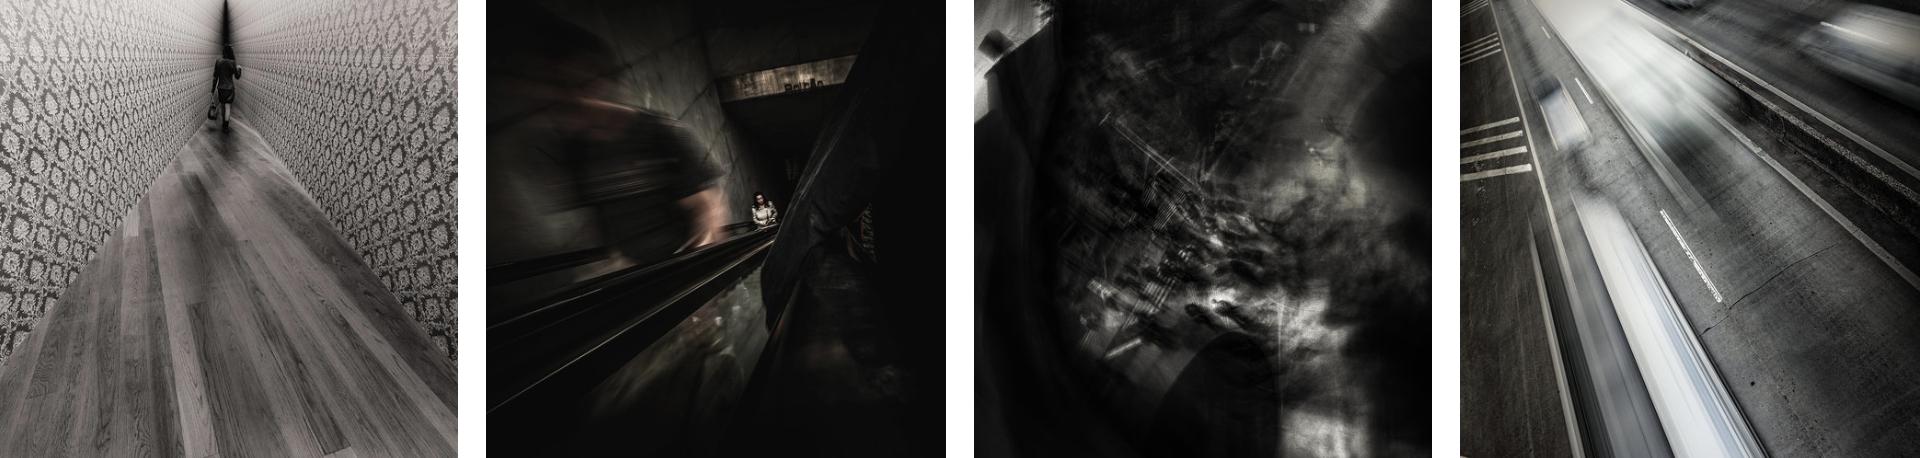 In Transit bonjourmolotov Andre Gigante Photography Experimenta Design 25B.png